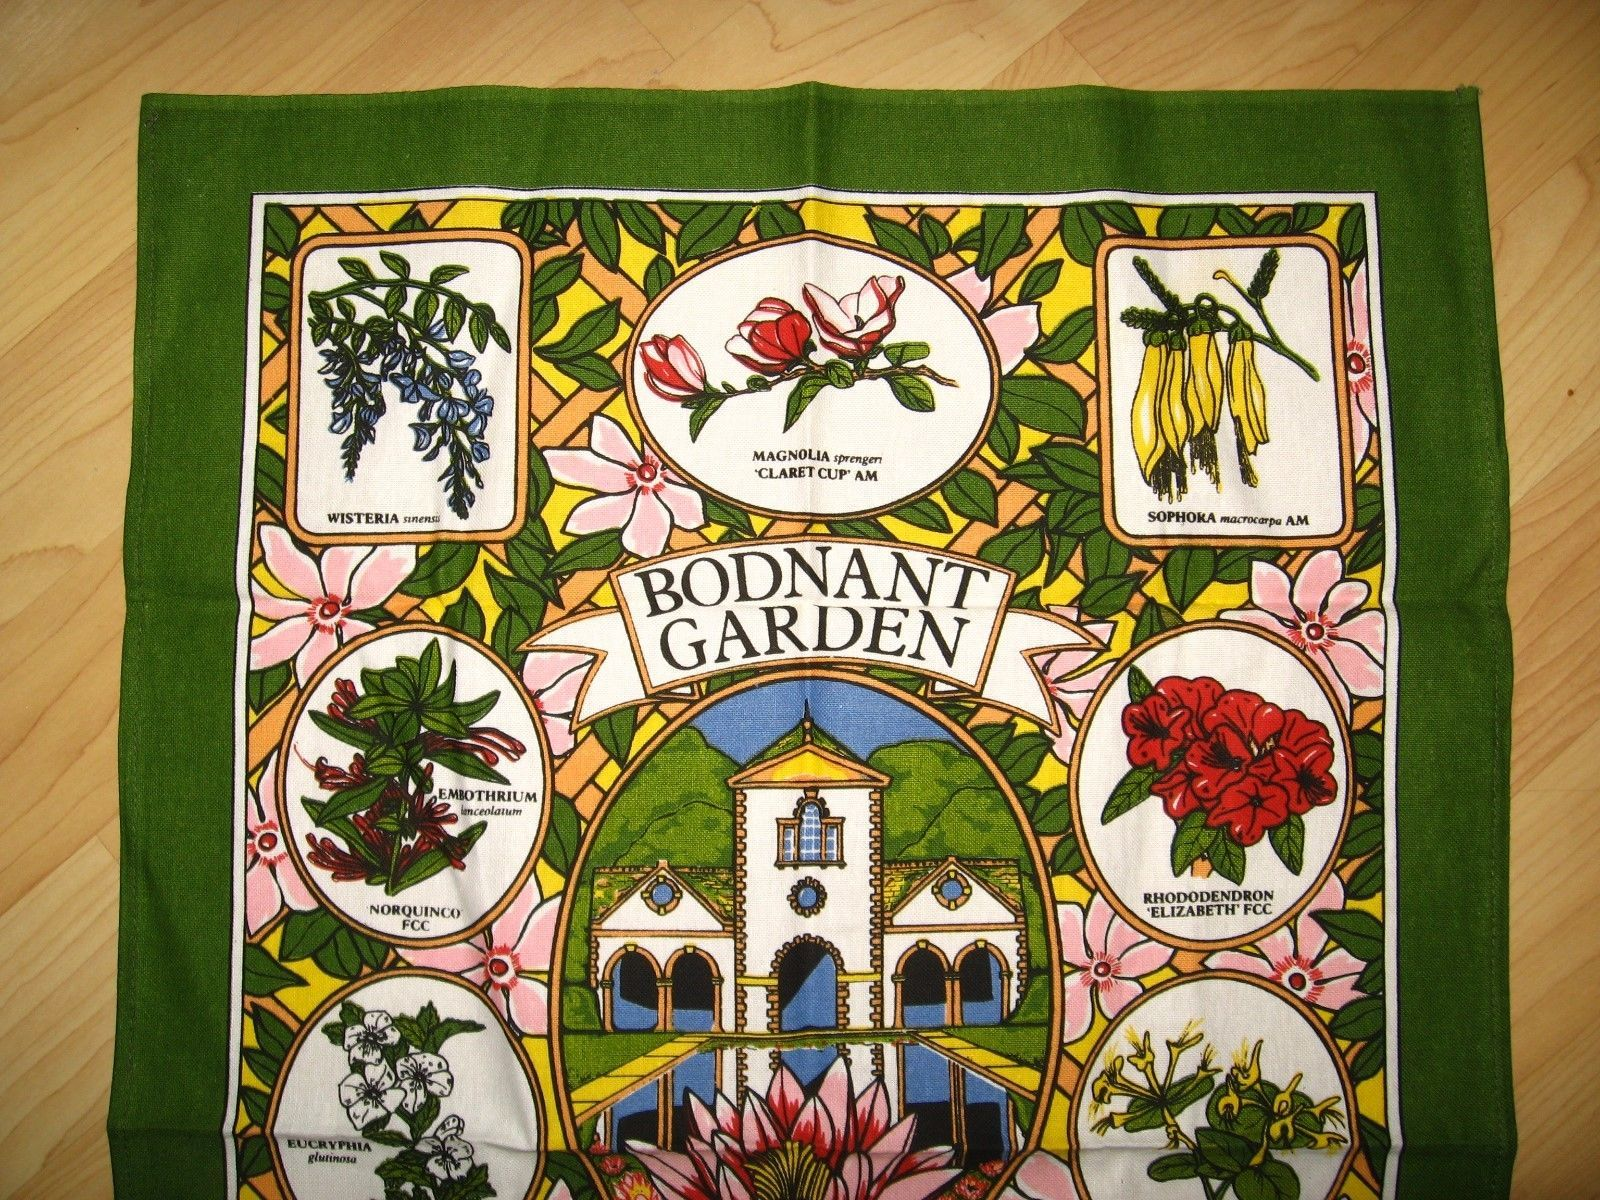 Bodnant Garden Souvenir Tea Towel - Vintage Sally Jane Textiles Colwyn Bay Wales image 2